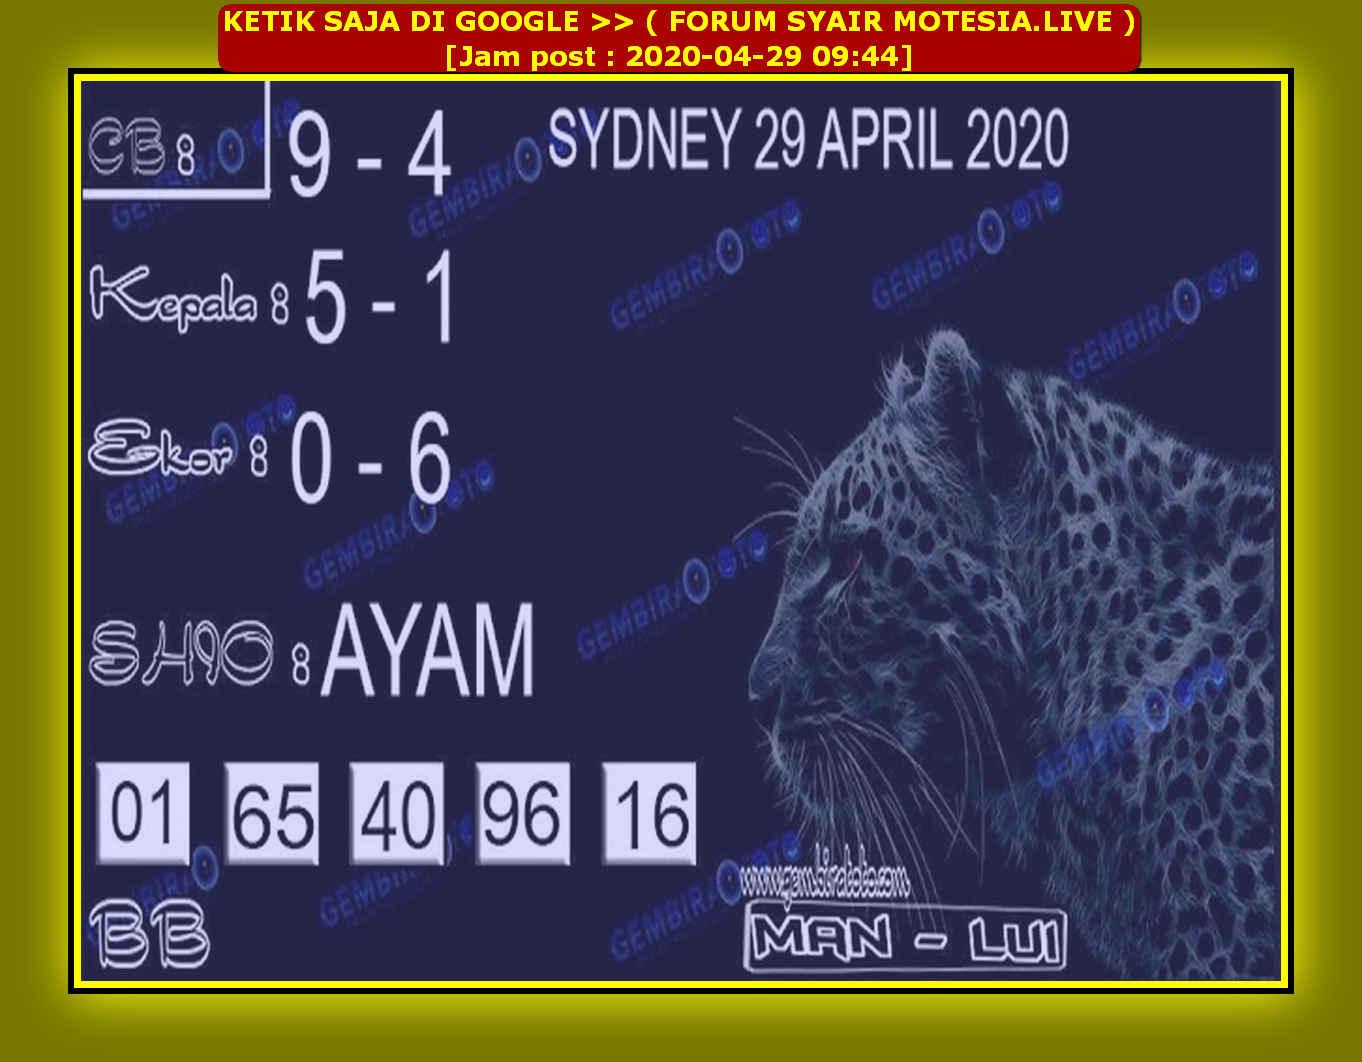 Kode syair Sydney Rabu 29 April 2020 59